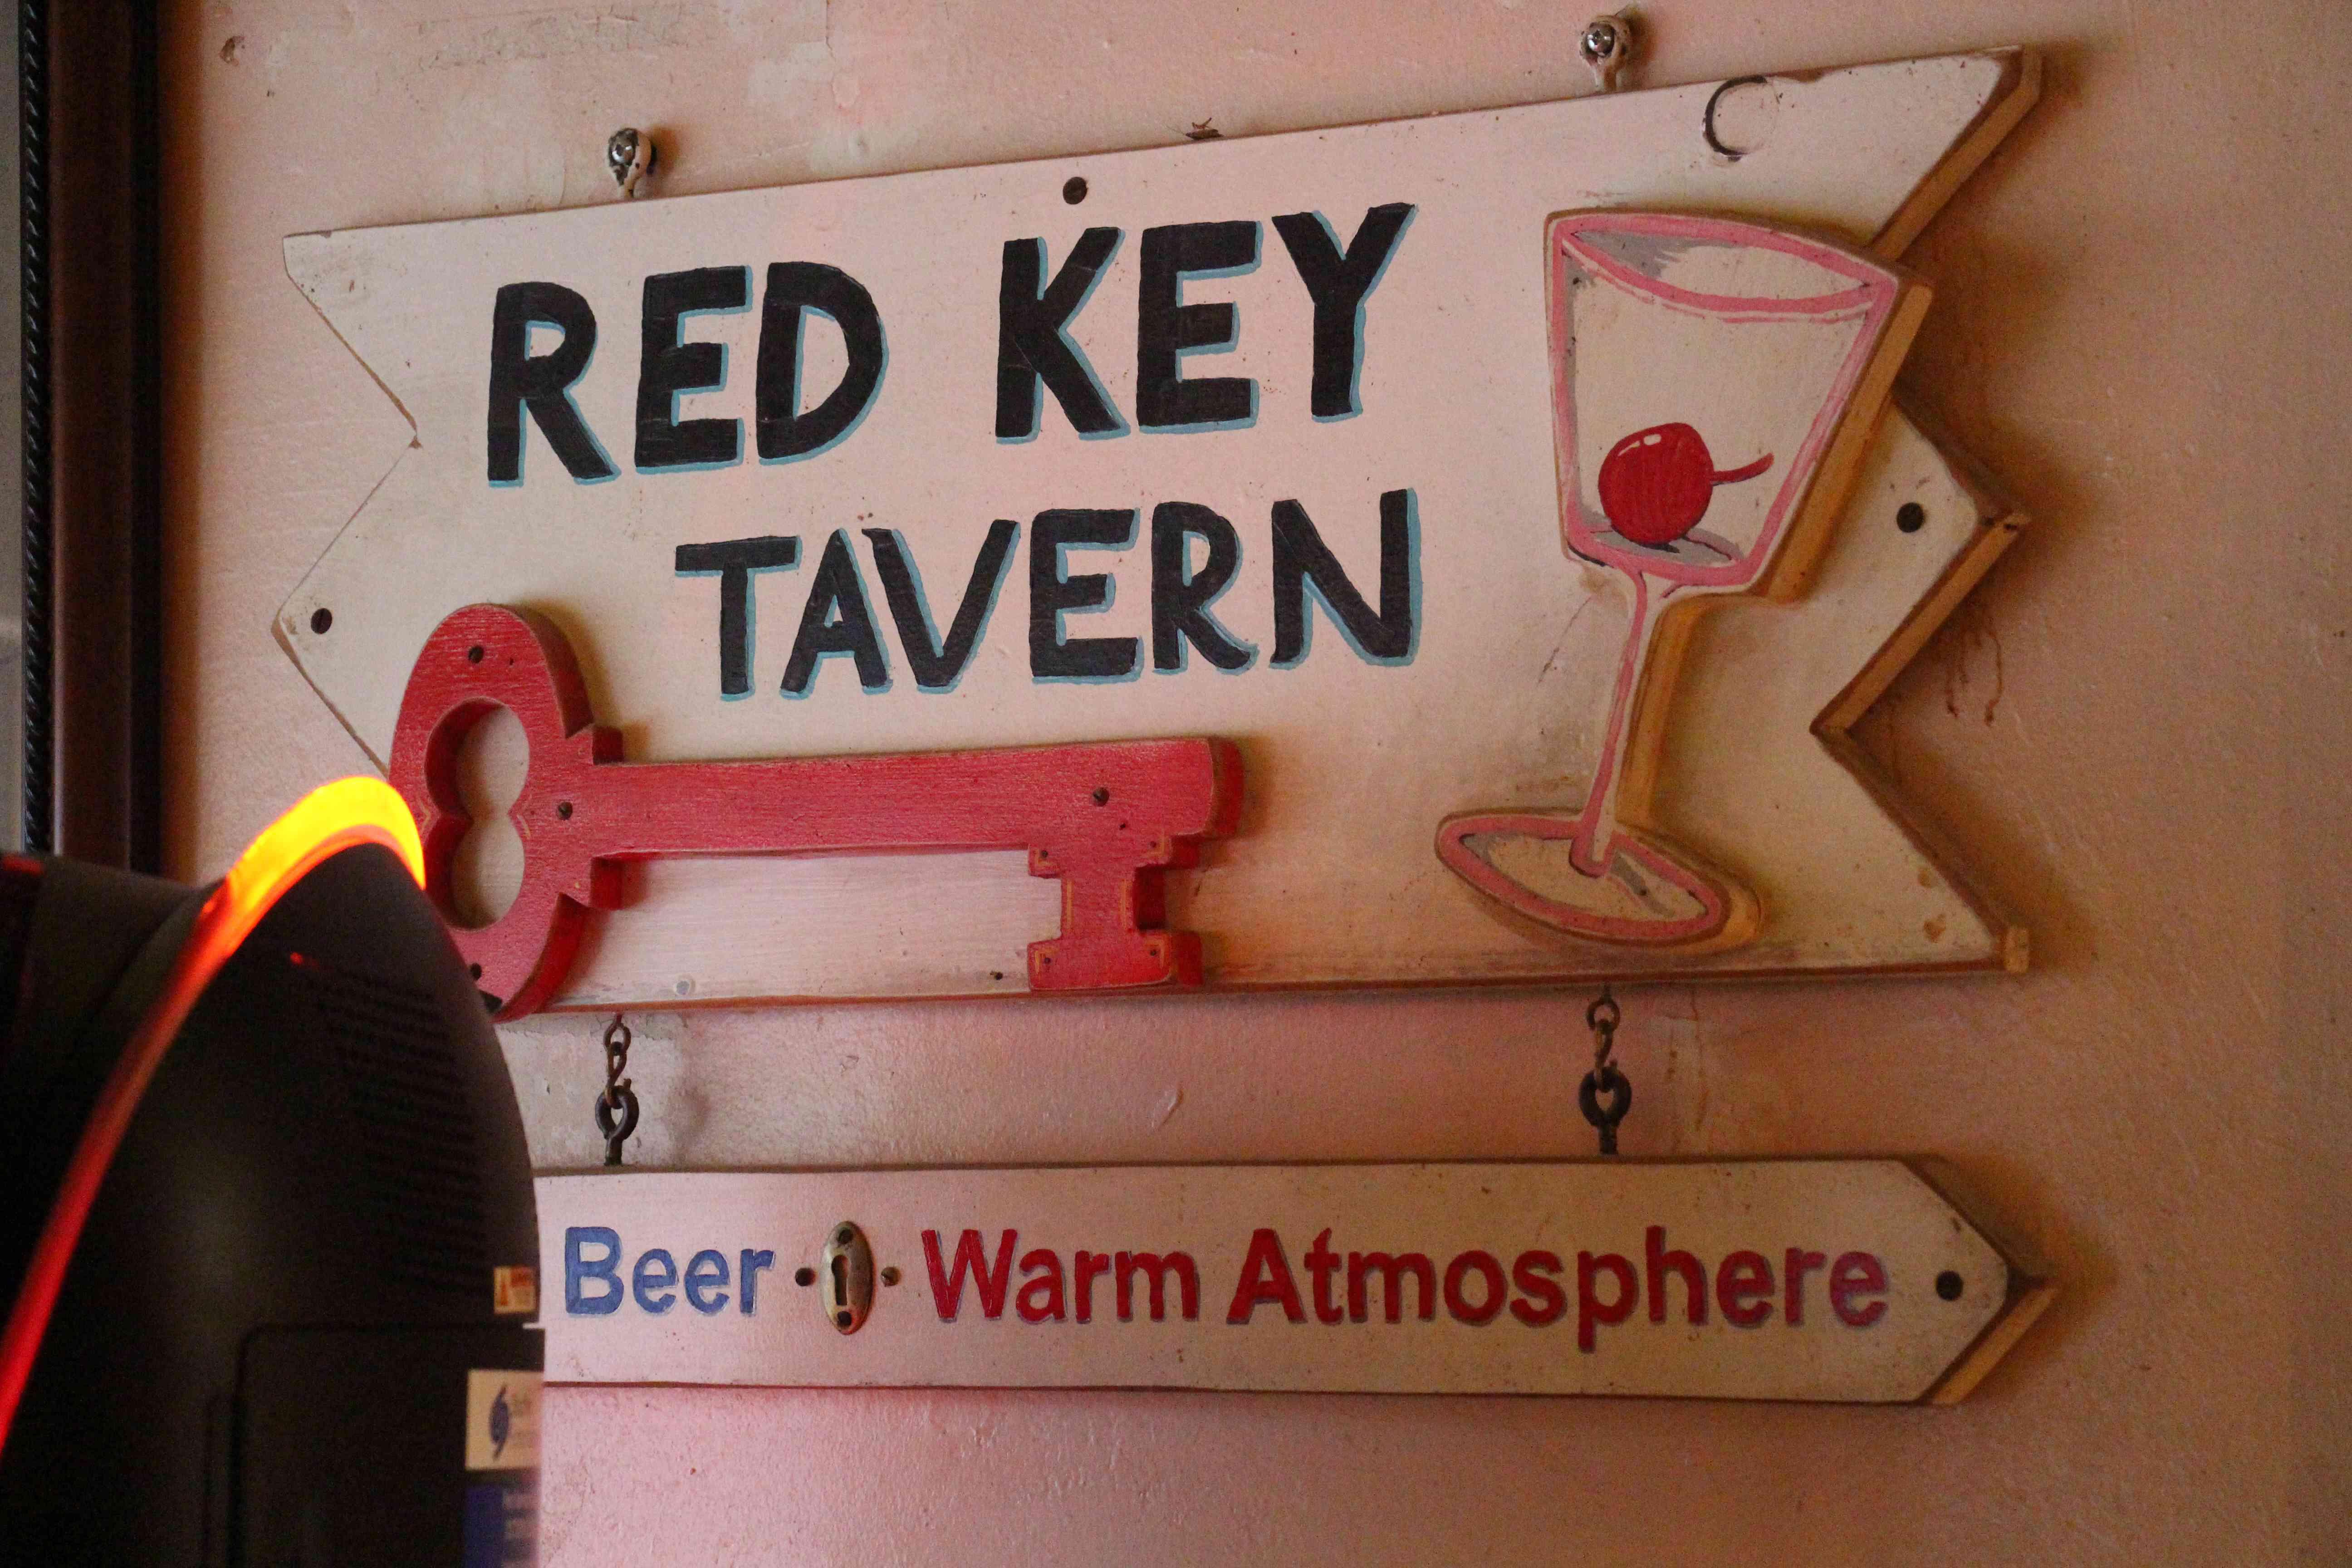 Red Key Tavern sign